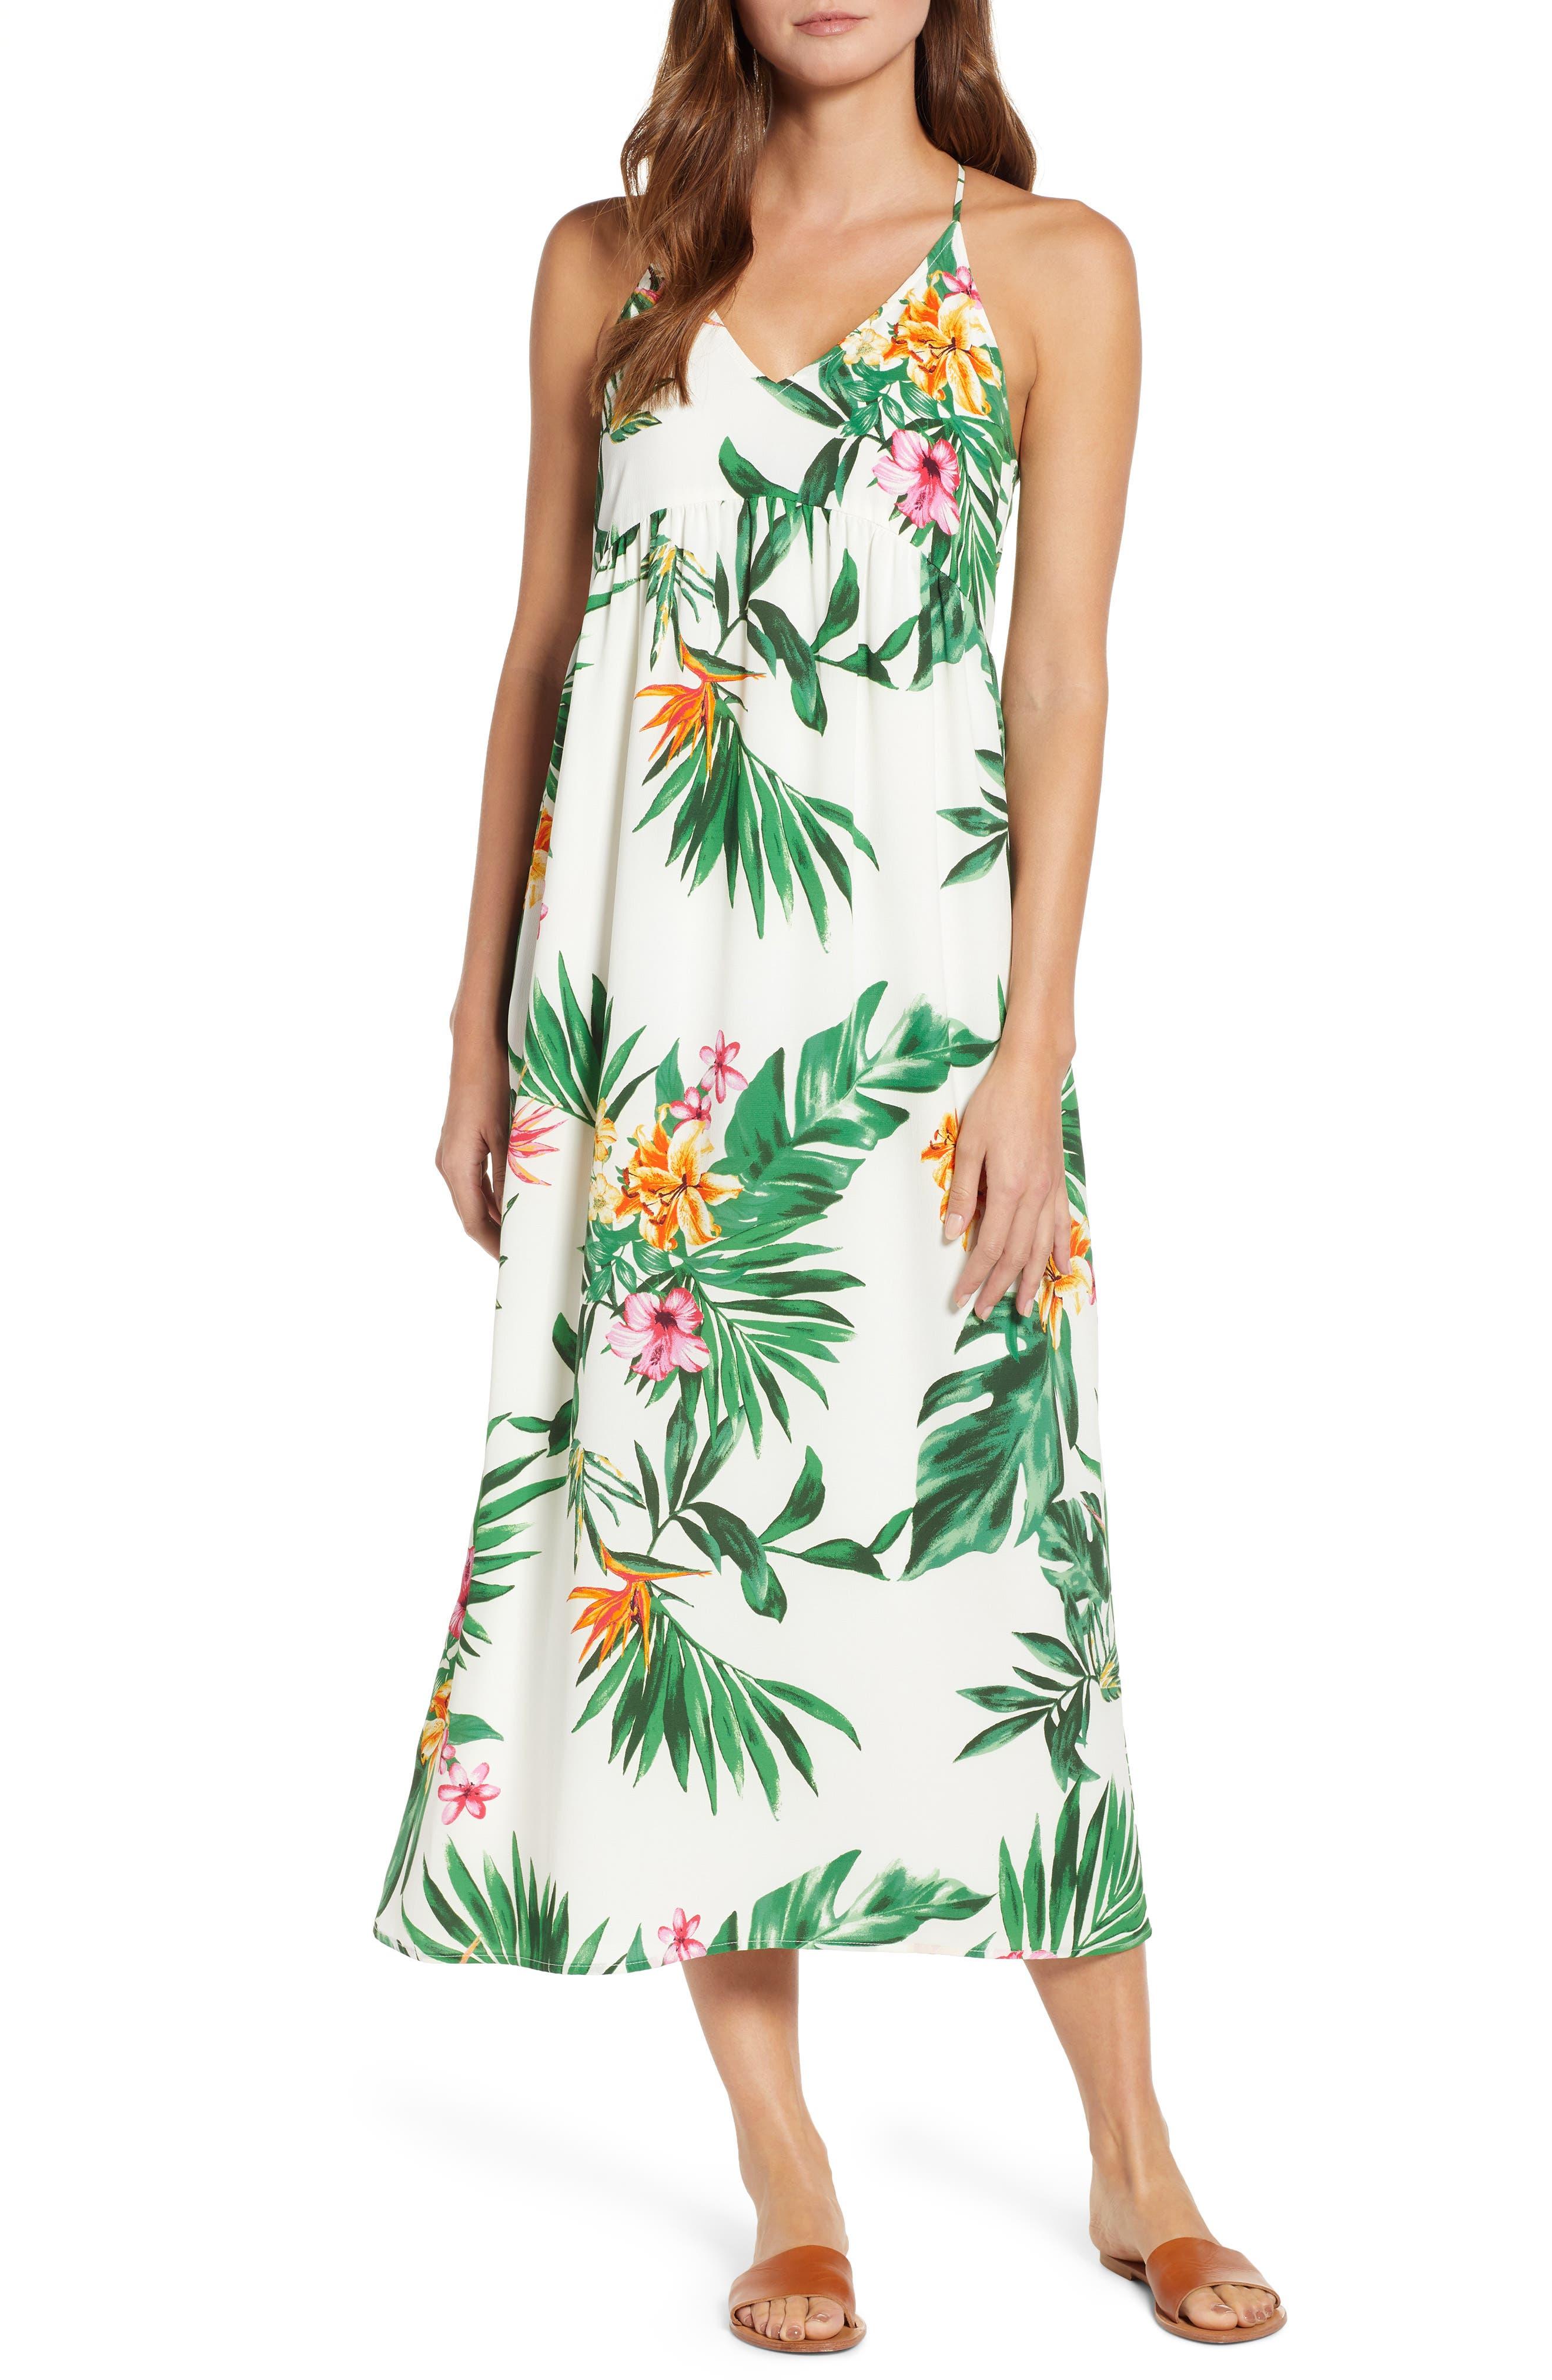 GIBSON, x Hi Sugarplum! Palm Springs Festival Maxi Dress, Main thumbnail 1, color, BIRD OF PARADISE